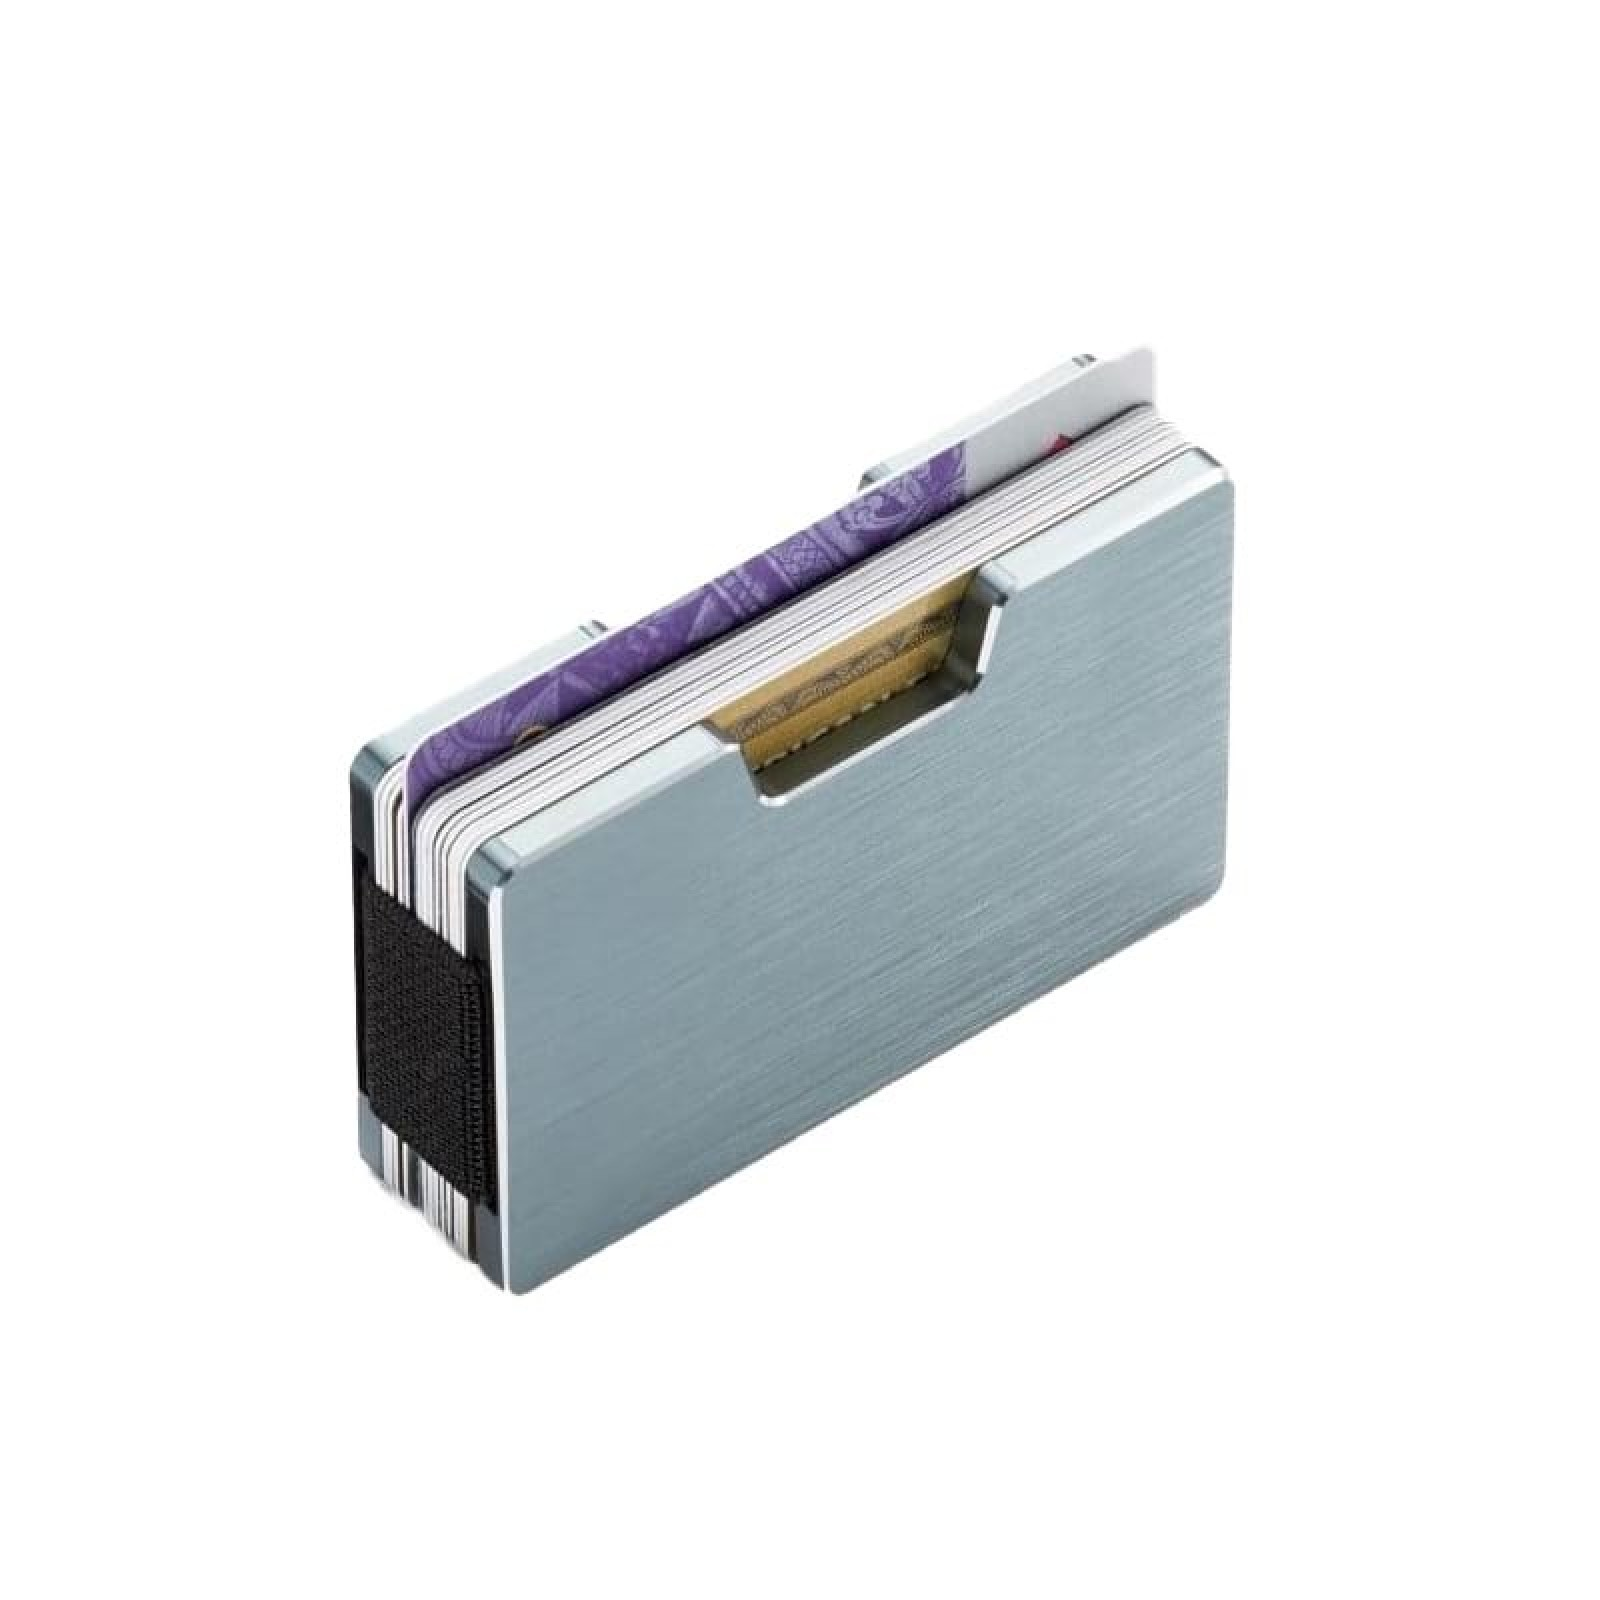 COOPER Cardholder with Money Clip (Silver) - Philippi